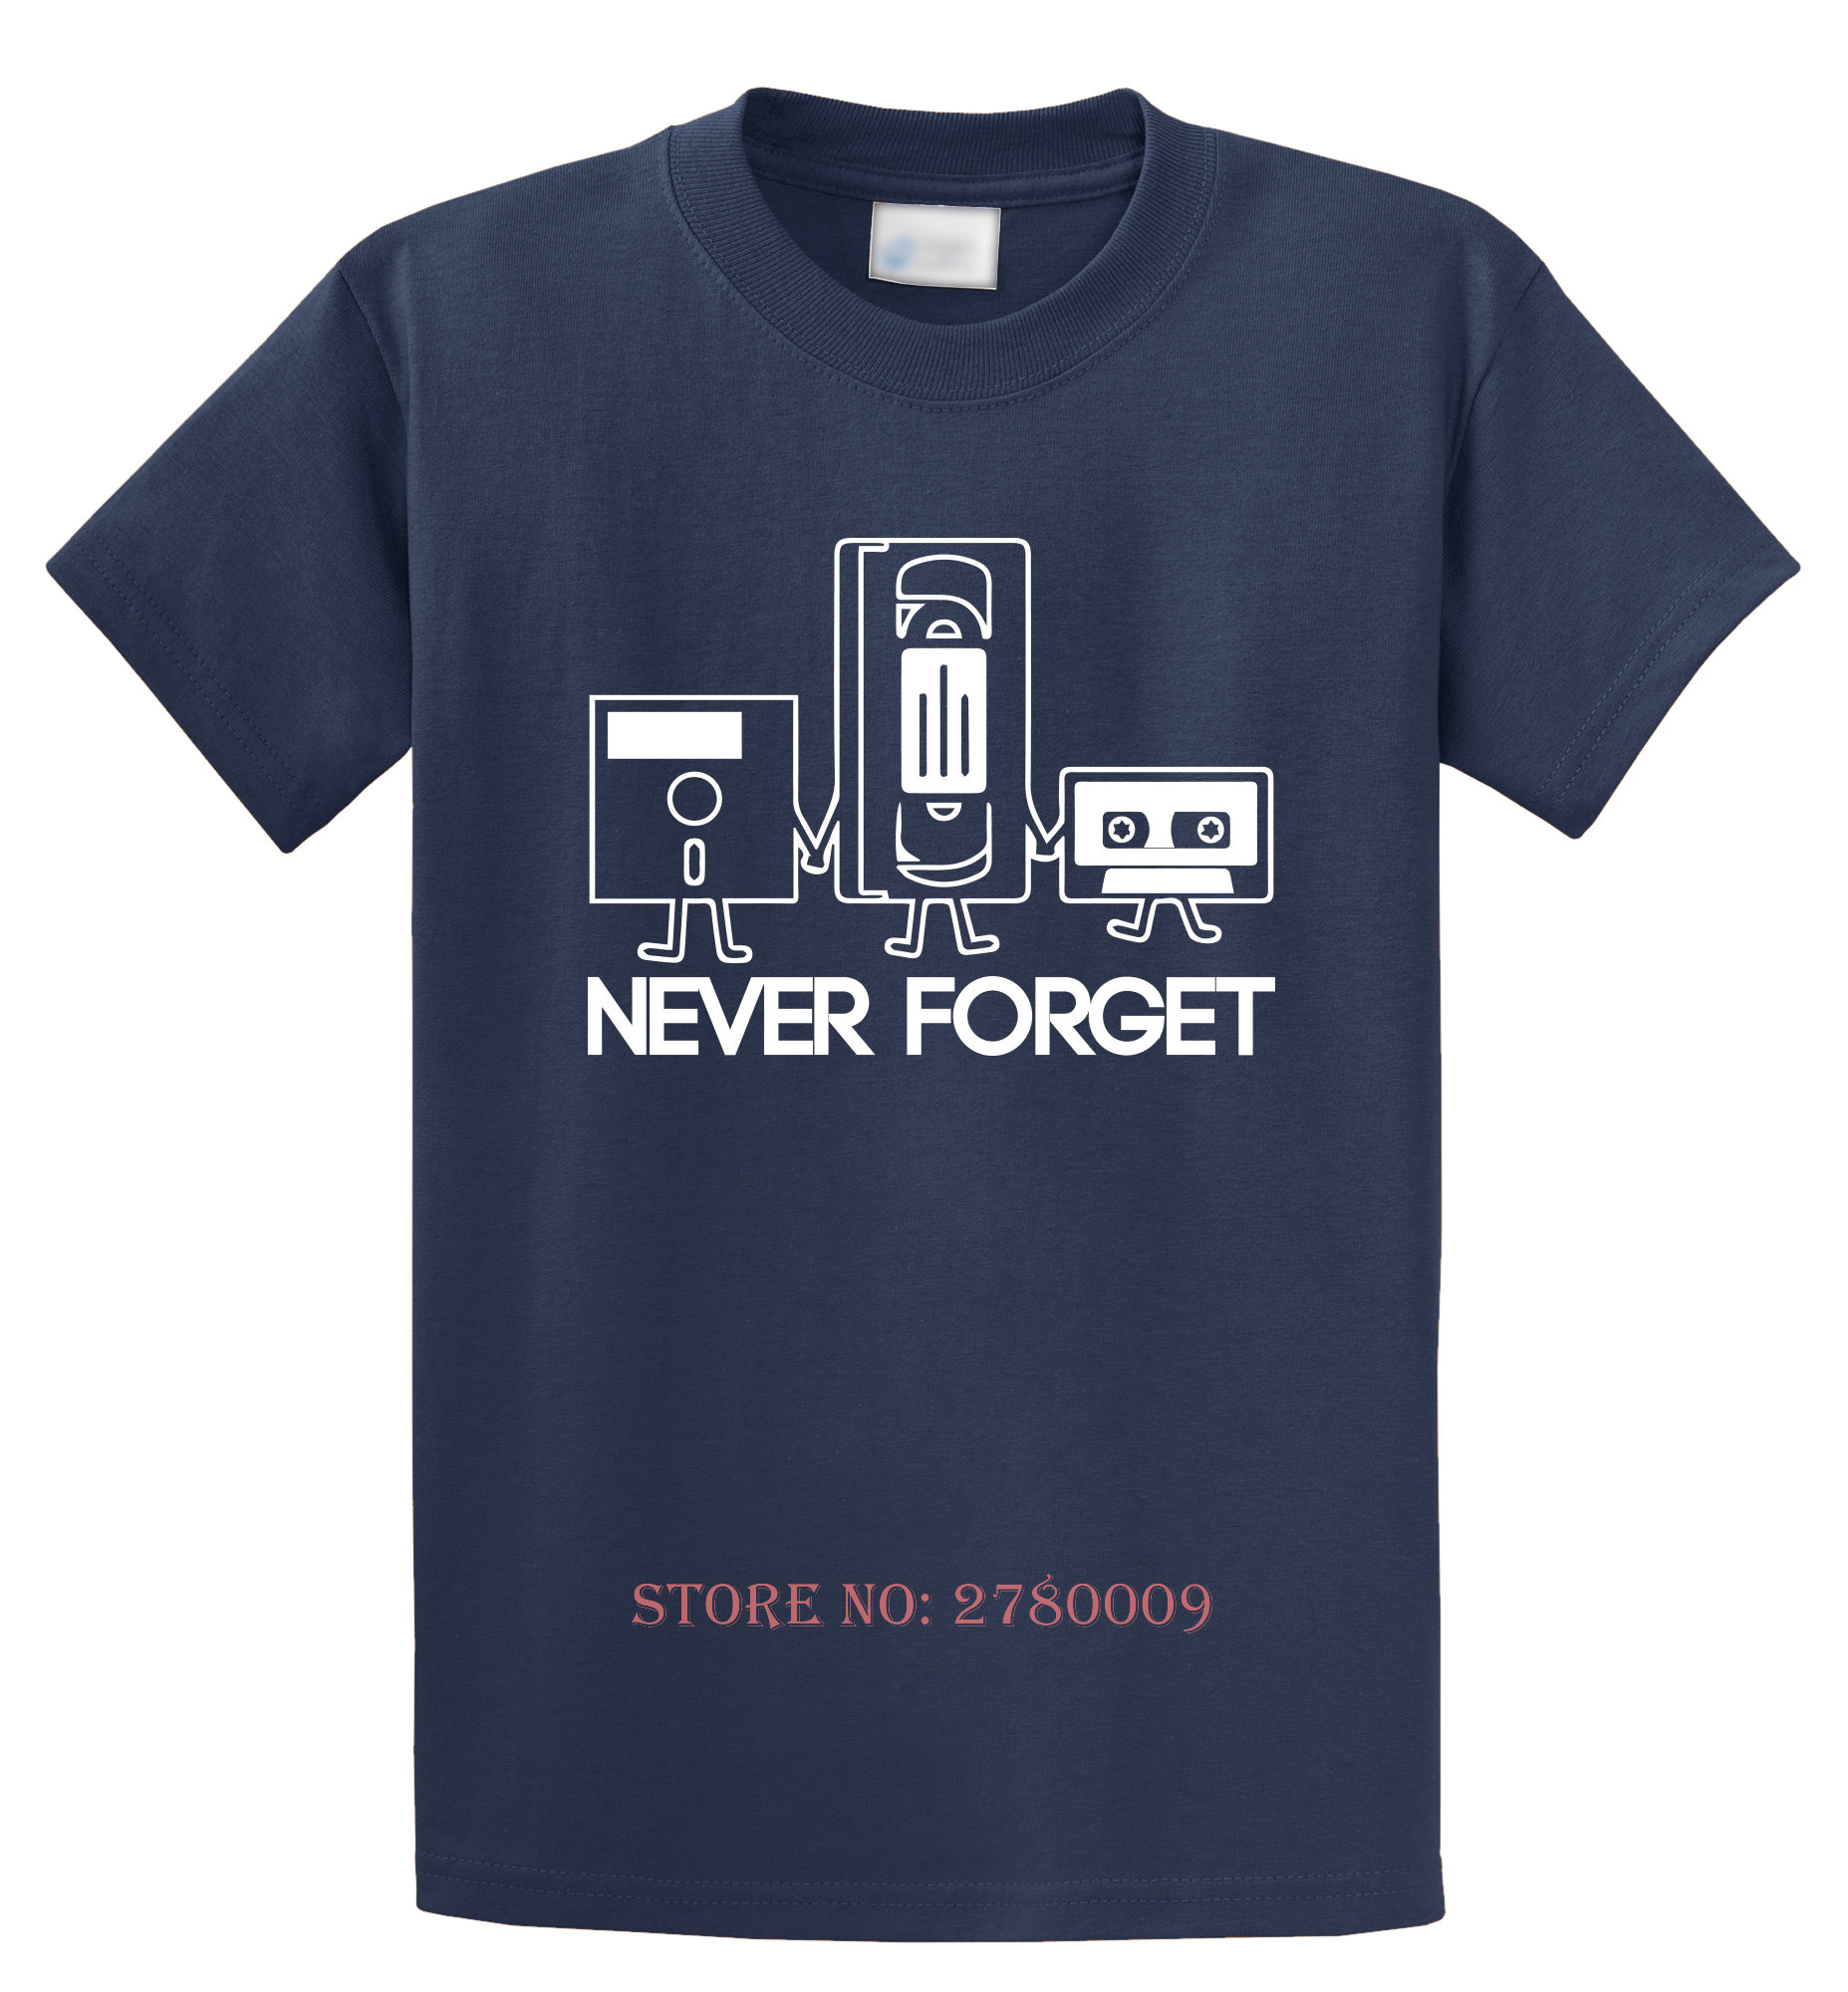 Never Forget Funny T Shirt Floppy Disc VHS Cassette Tech Geek Gift ...